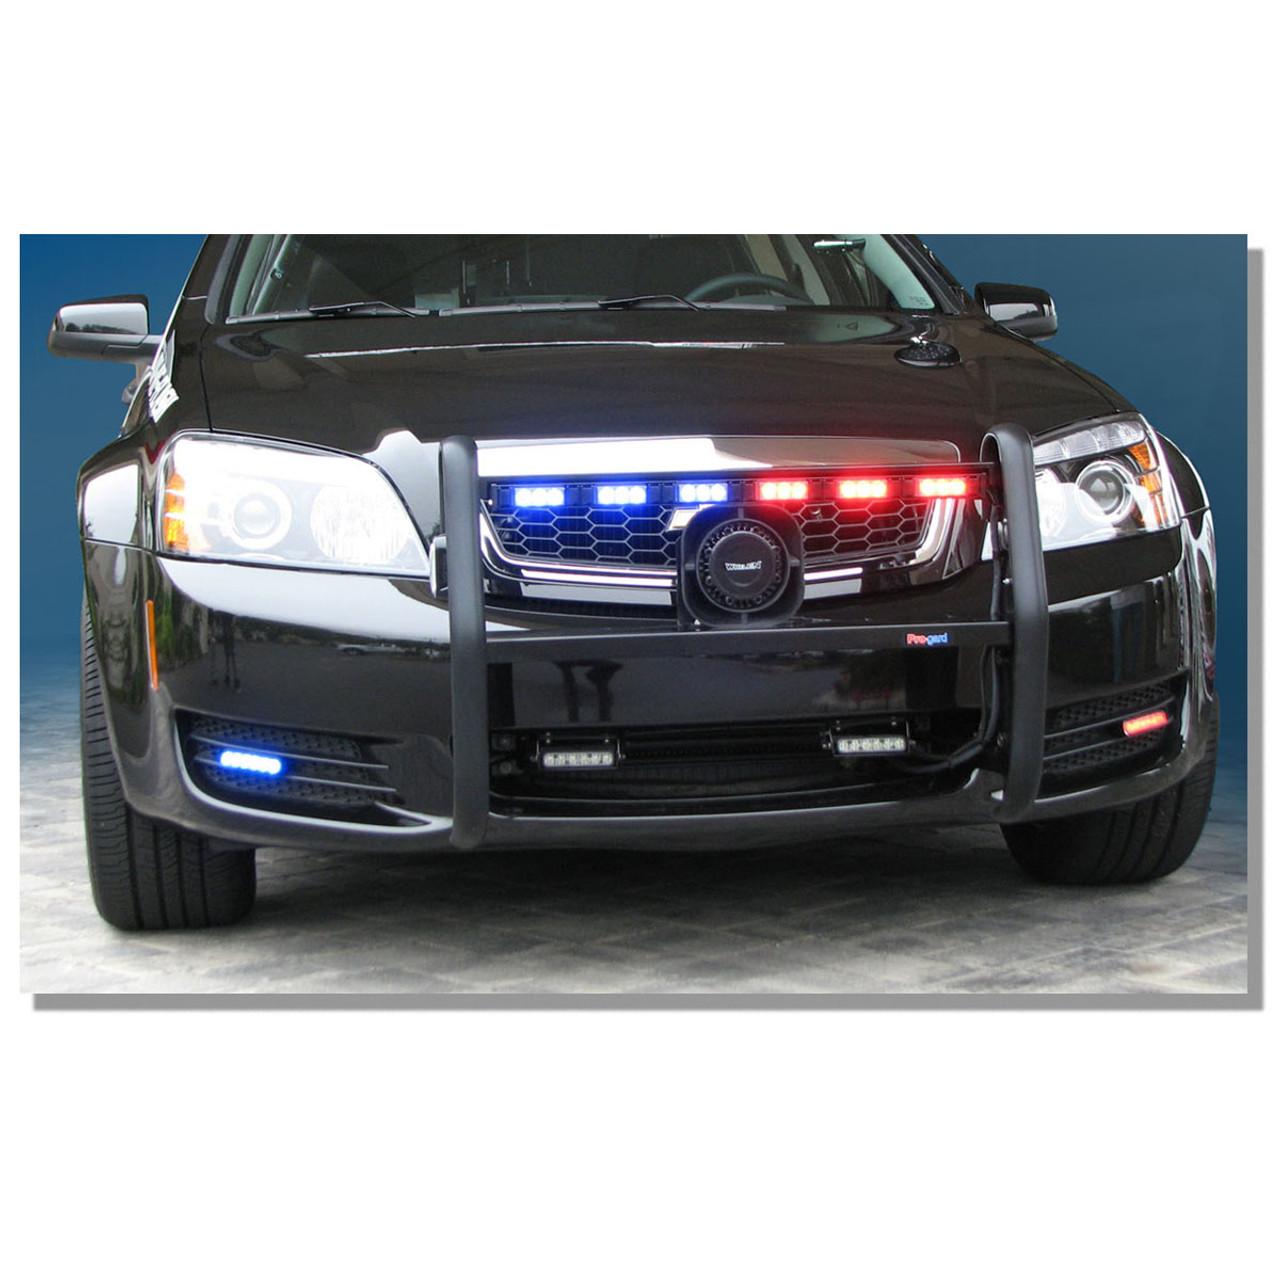 Caprice Police Push Bumper Grill Guard by Progard